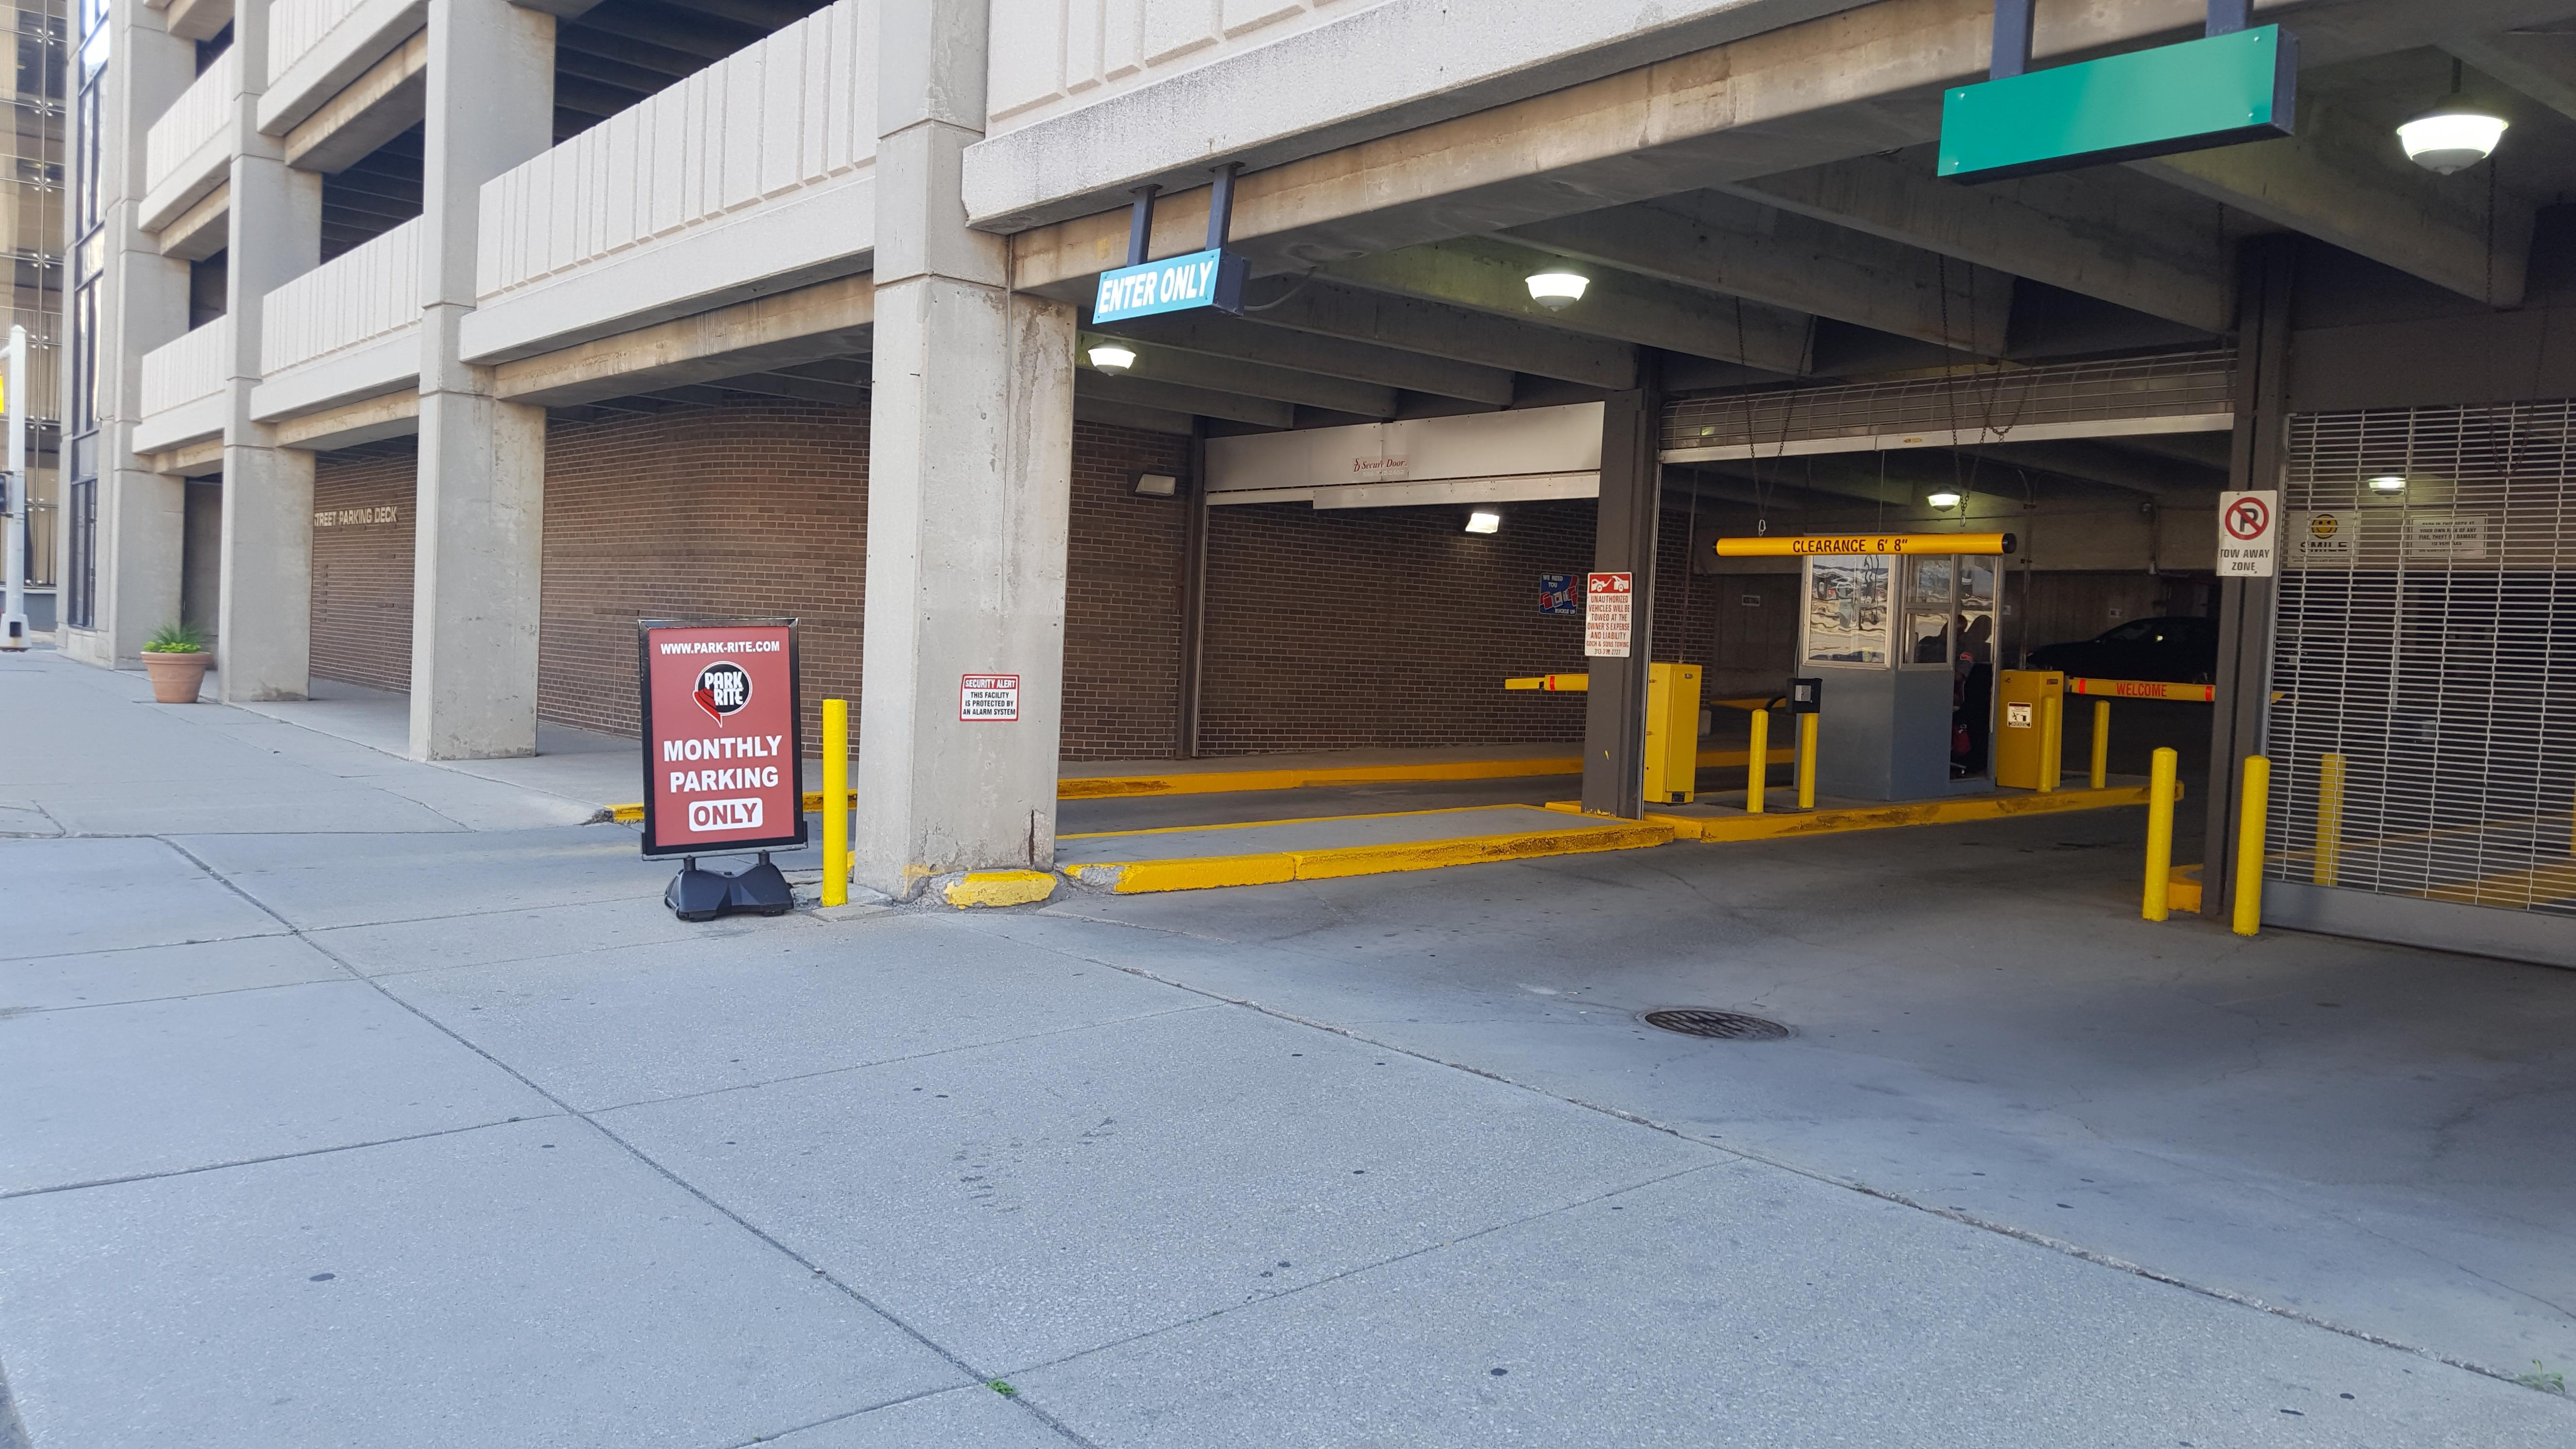 621 1st St Garage Parking In Detroit Parkme